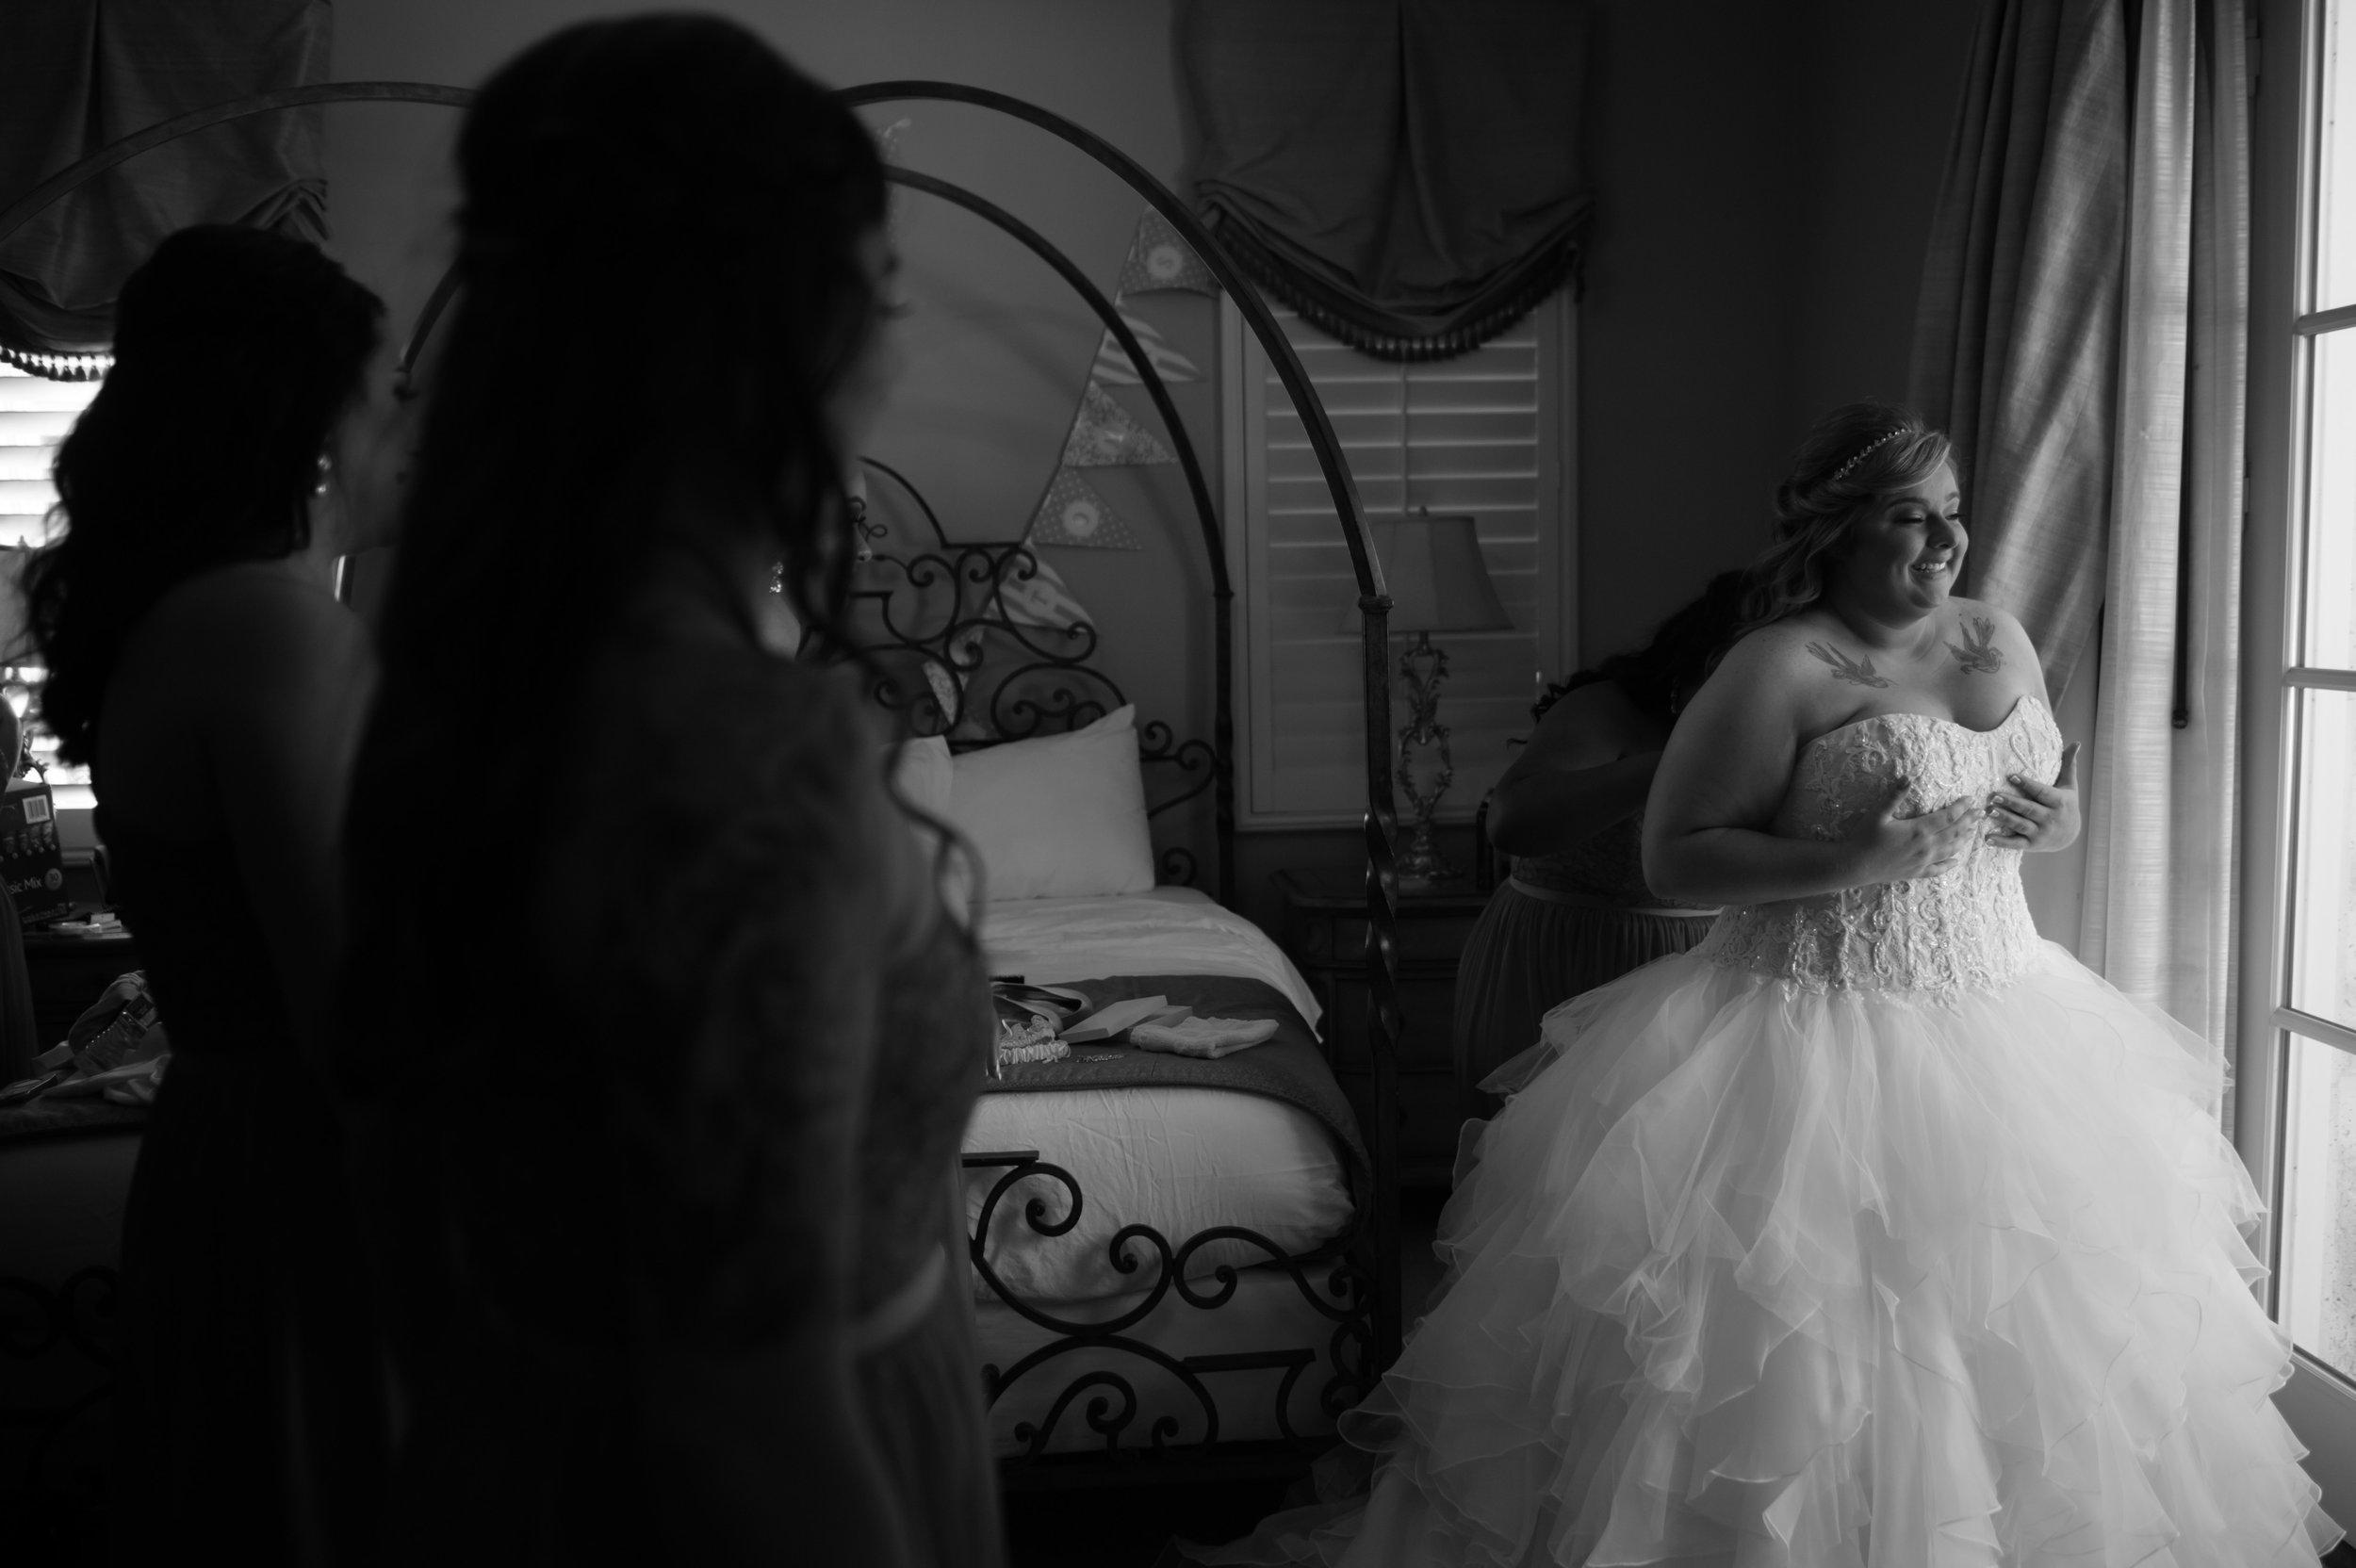 lyndzie-javier-007-arden-hills-sacramento-wedding-photographer-katherine-nicole-photography.JPG